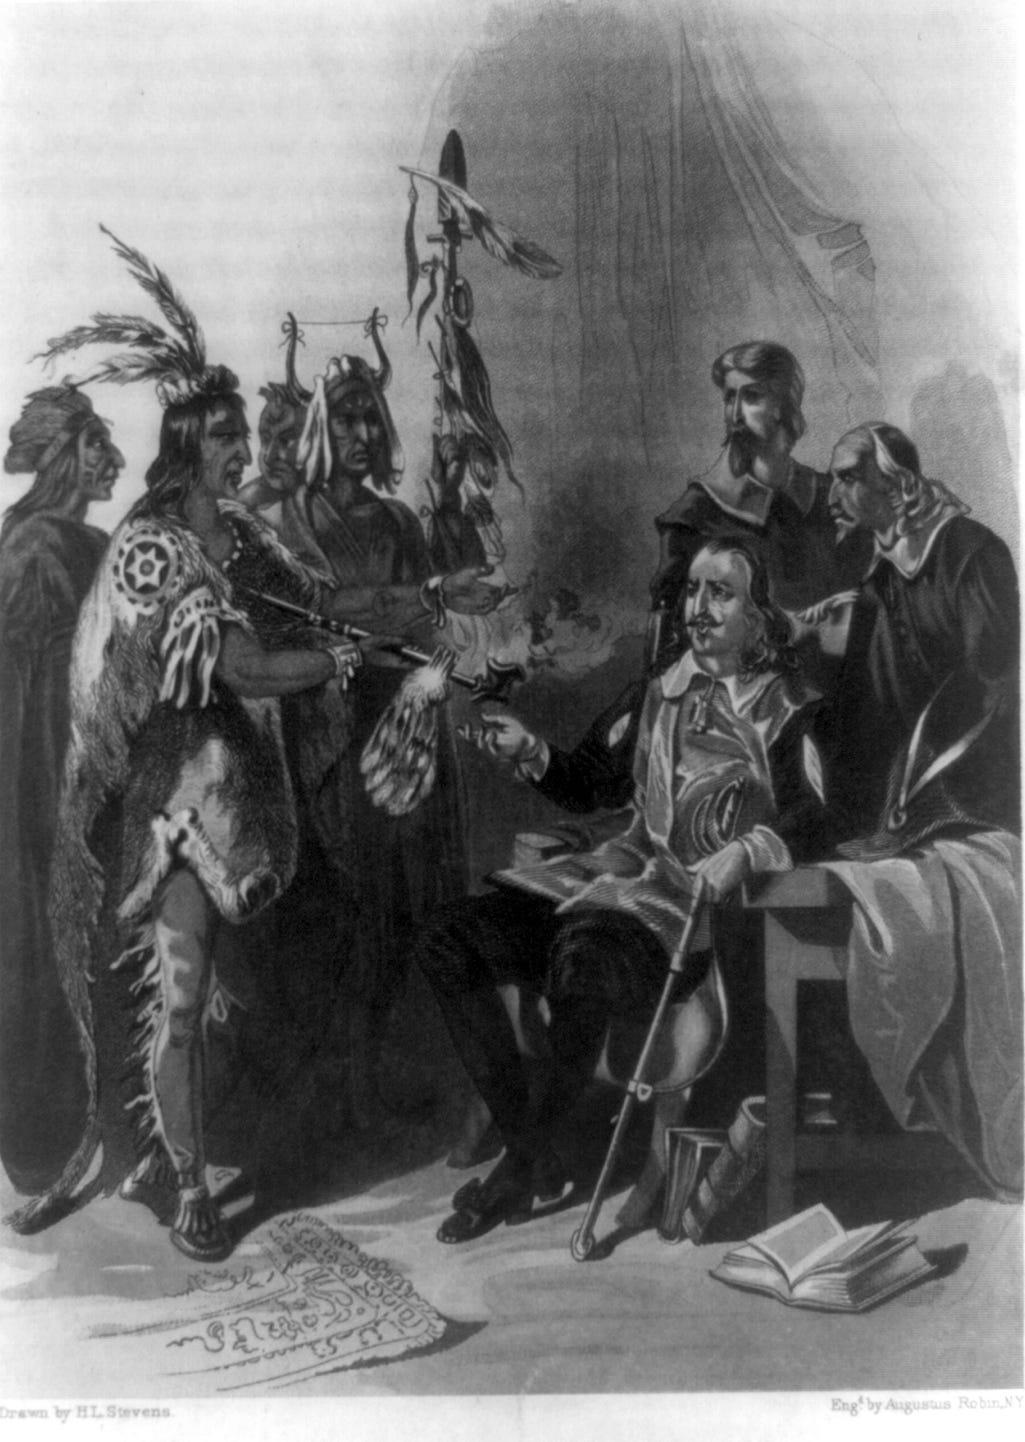 Massasoit (Great Sachem) Ousamequin meets Gov. William Bradford in this sketch.